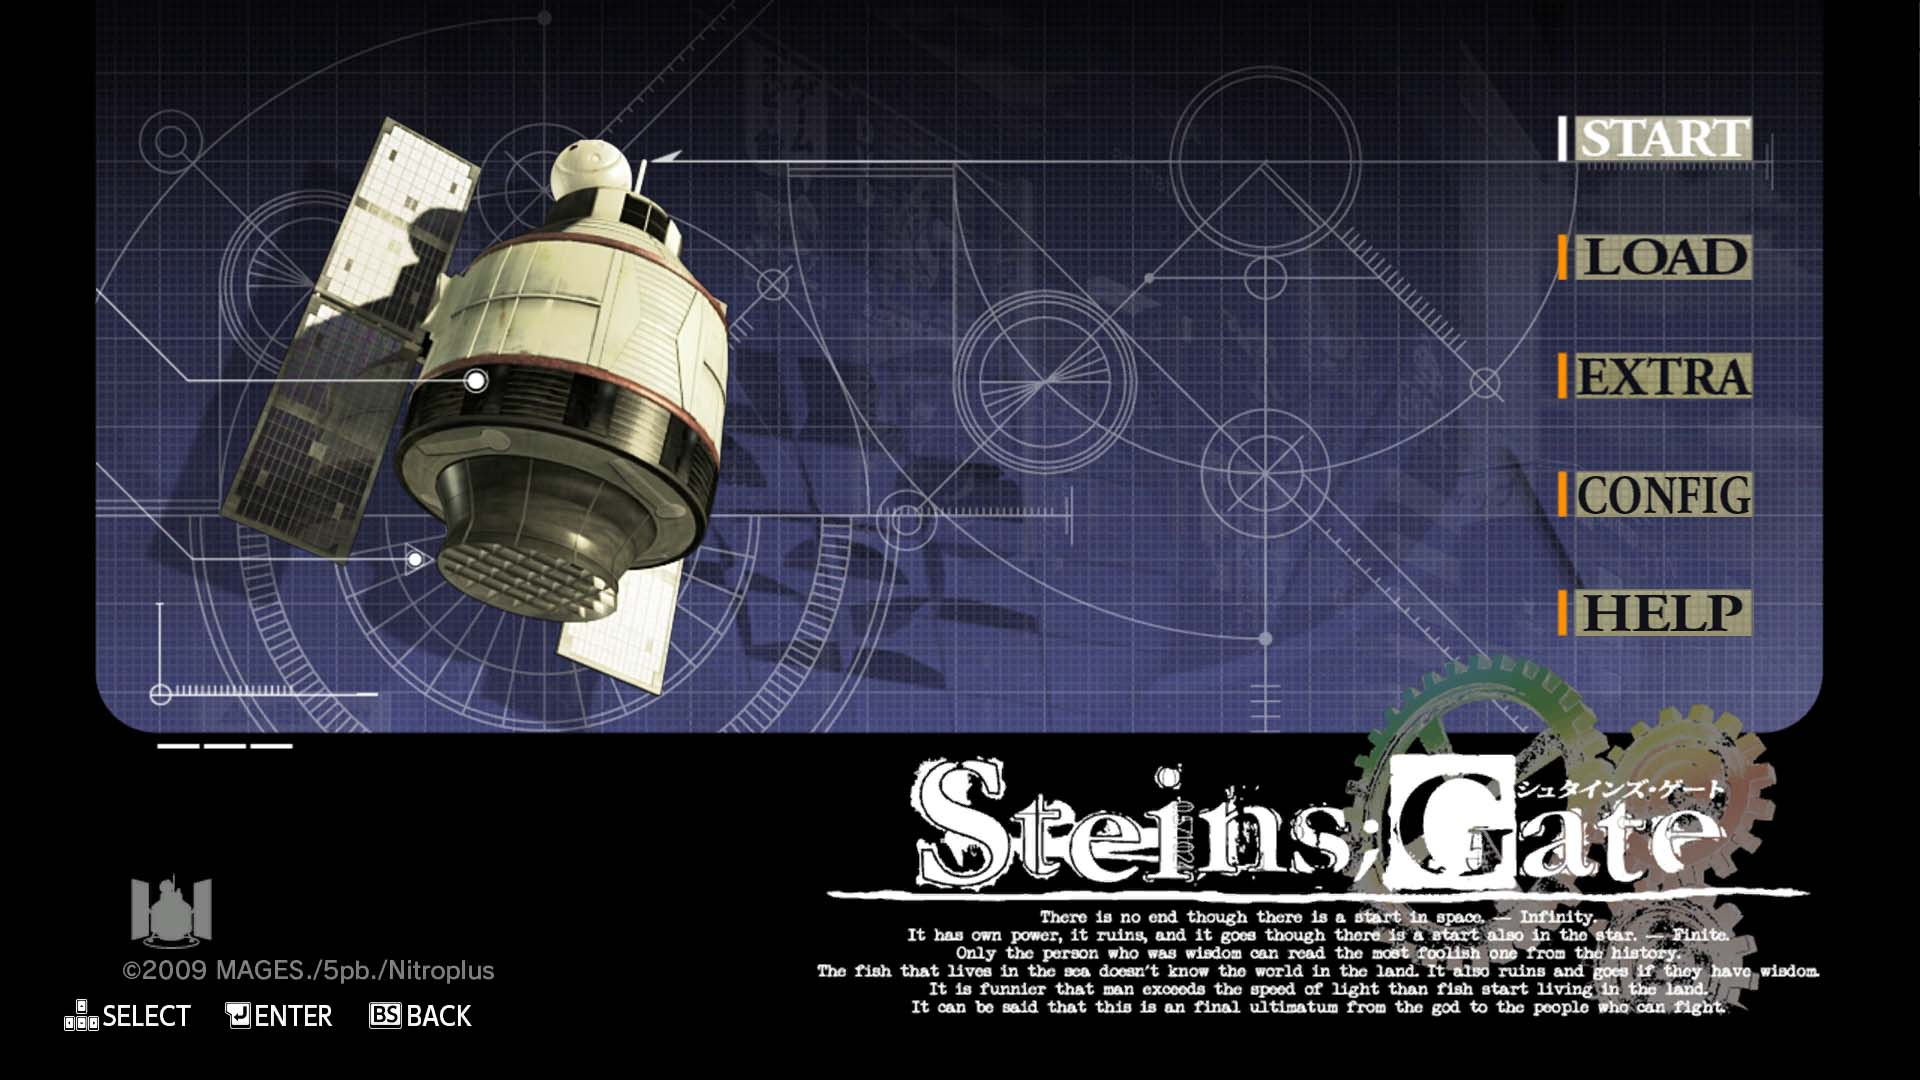 Review: Steins;Gate